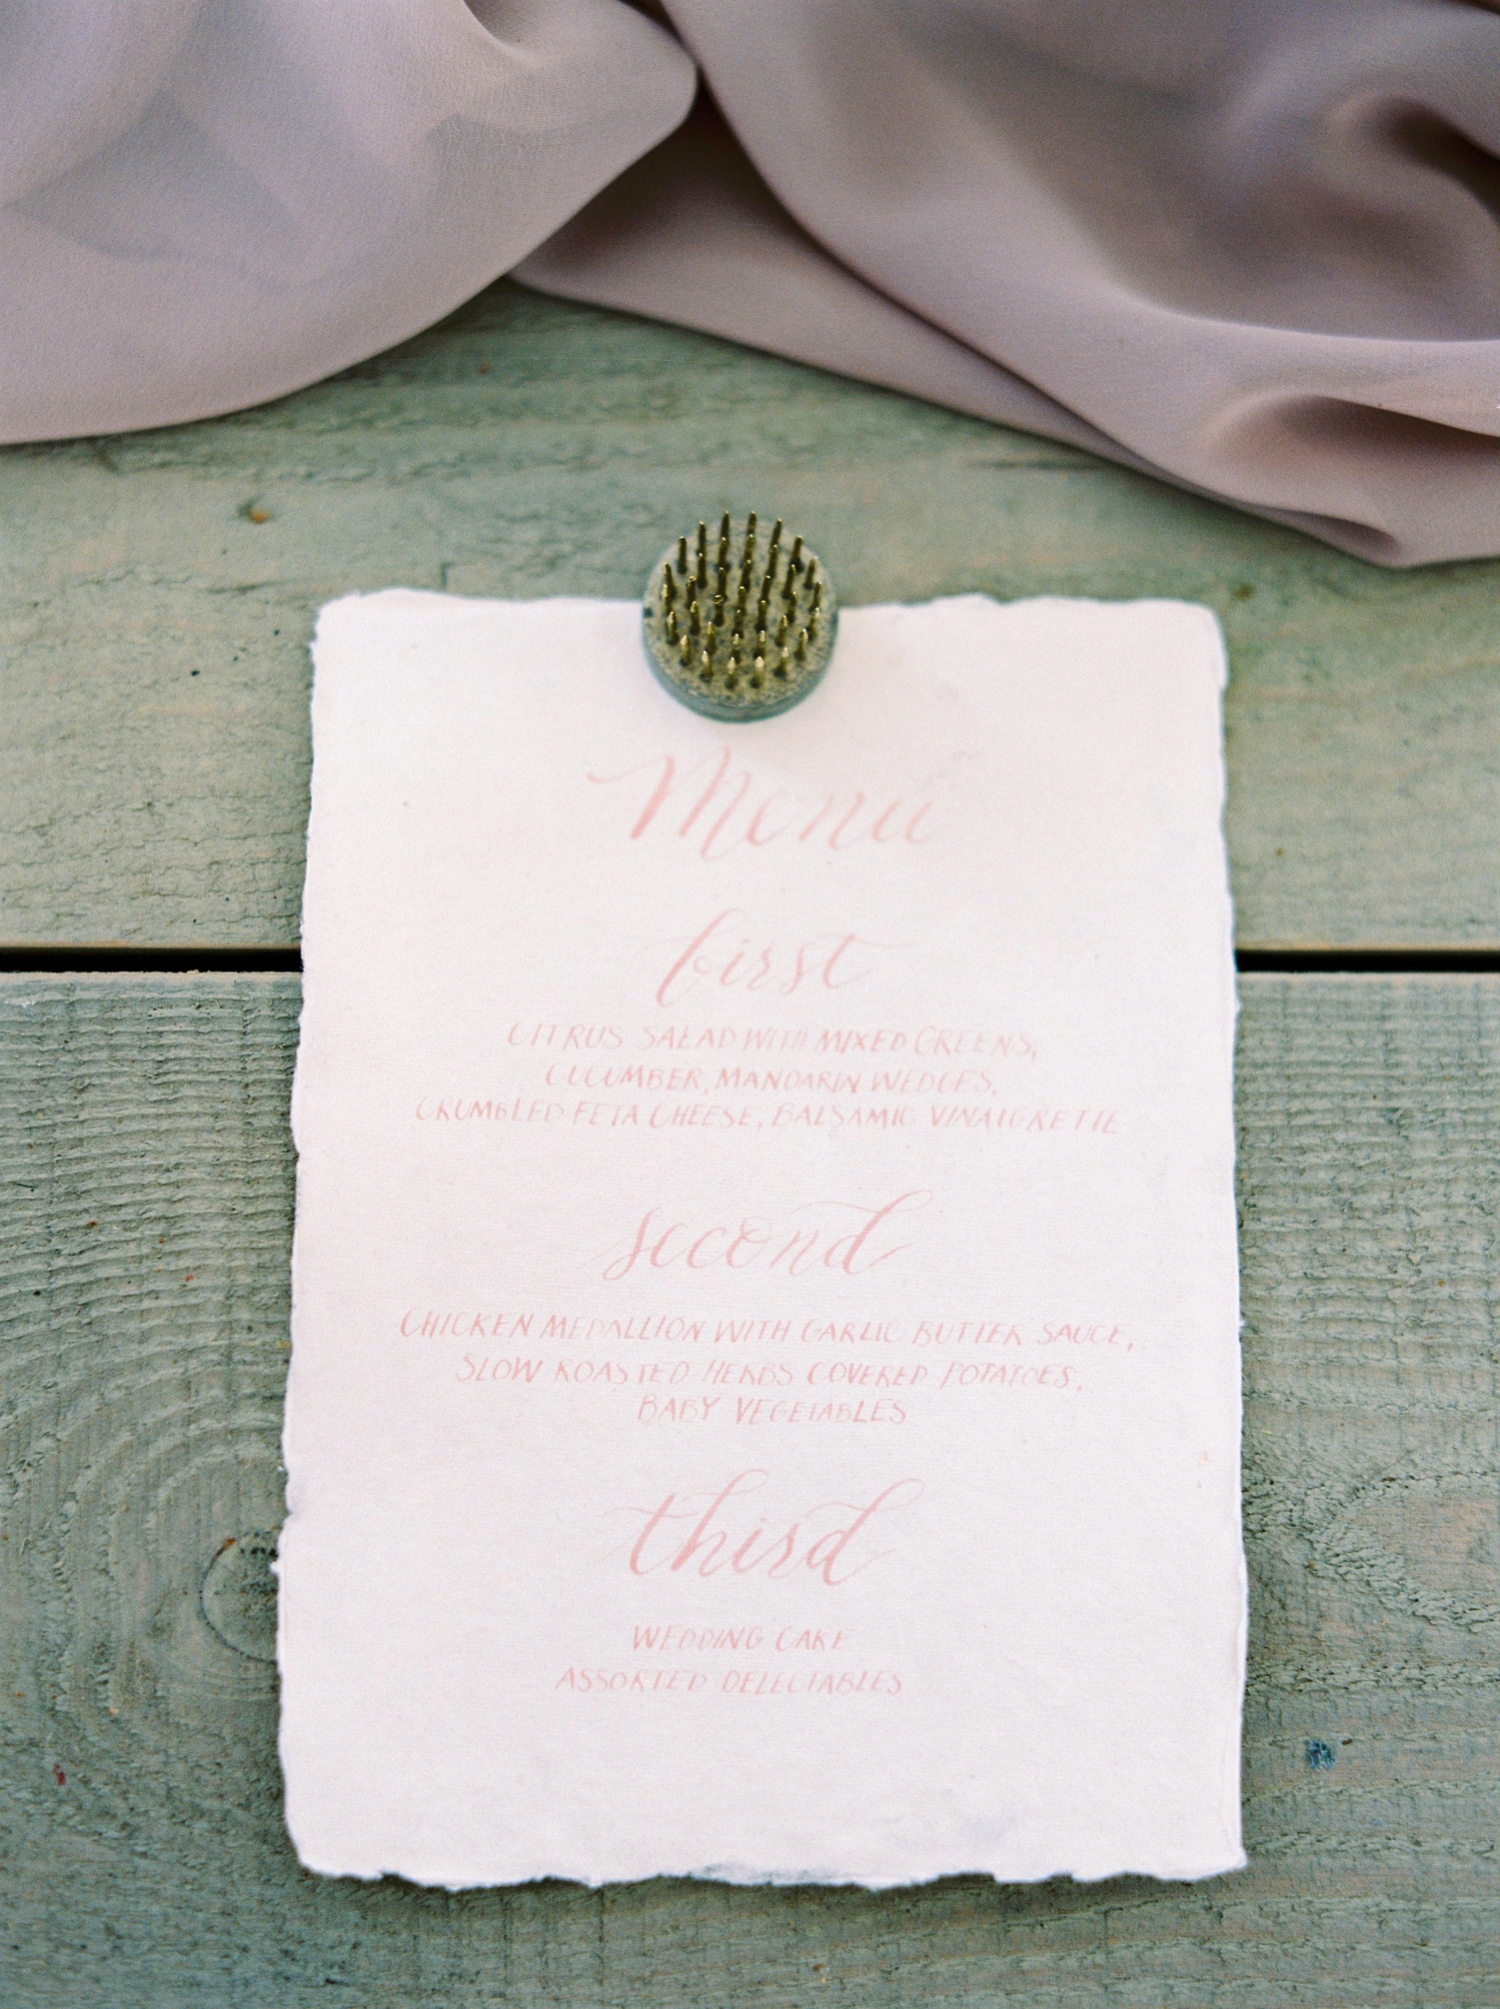 Calgary wedding photographers | fine art film | Justine Milton Photography | wedding details | editorial | wedding inspiration | wedding reception | wedding menu